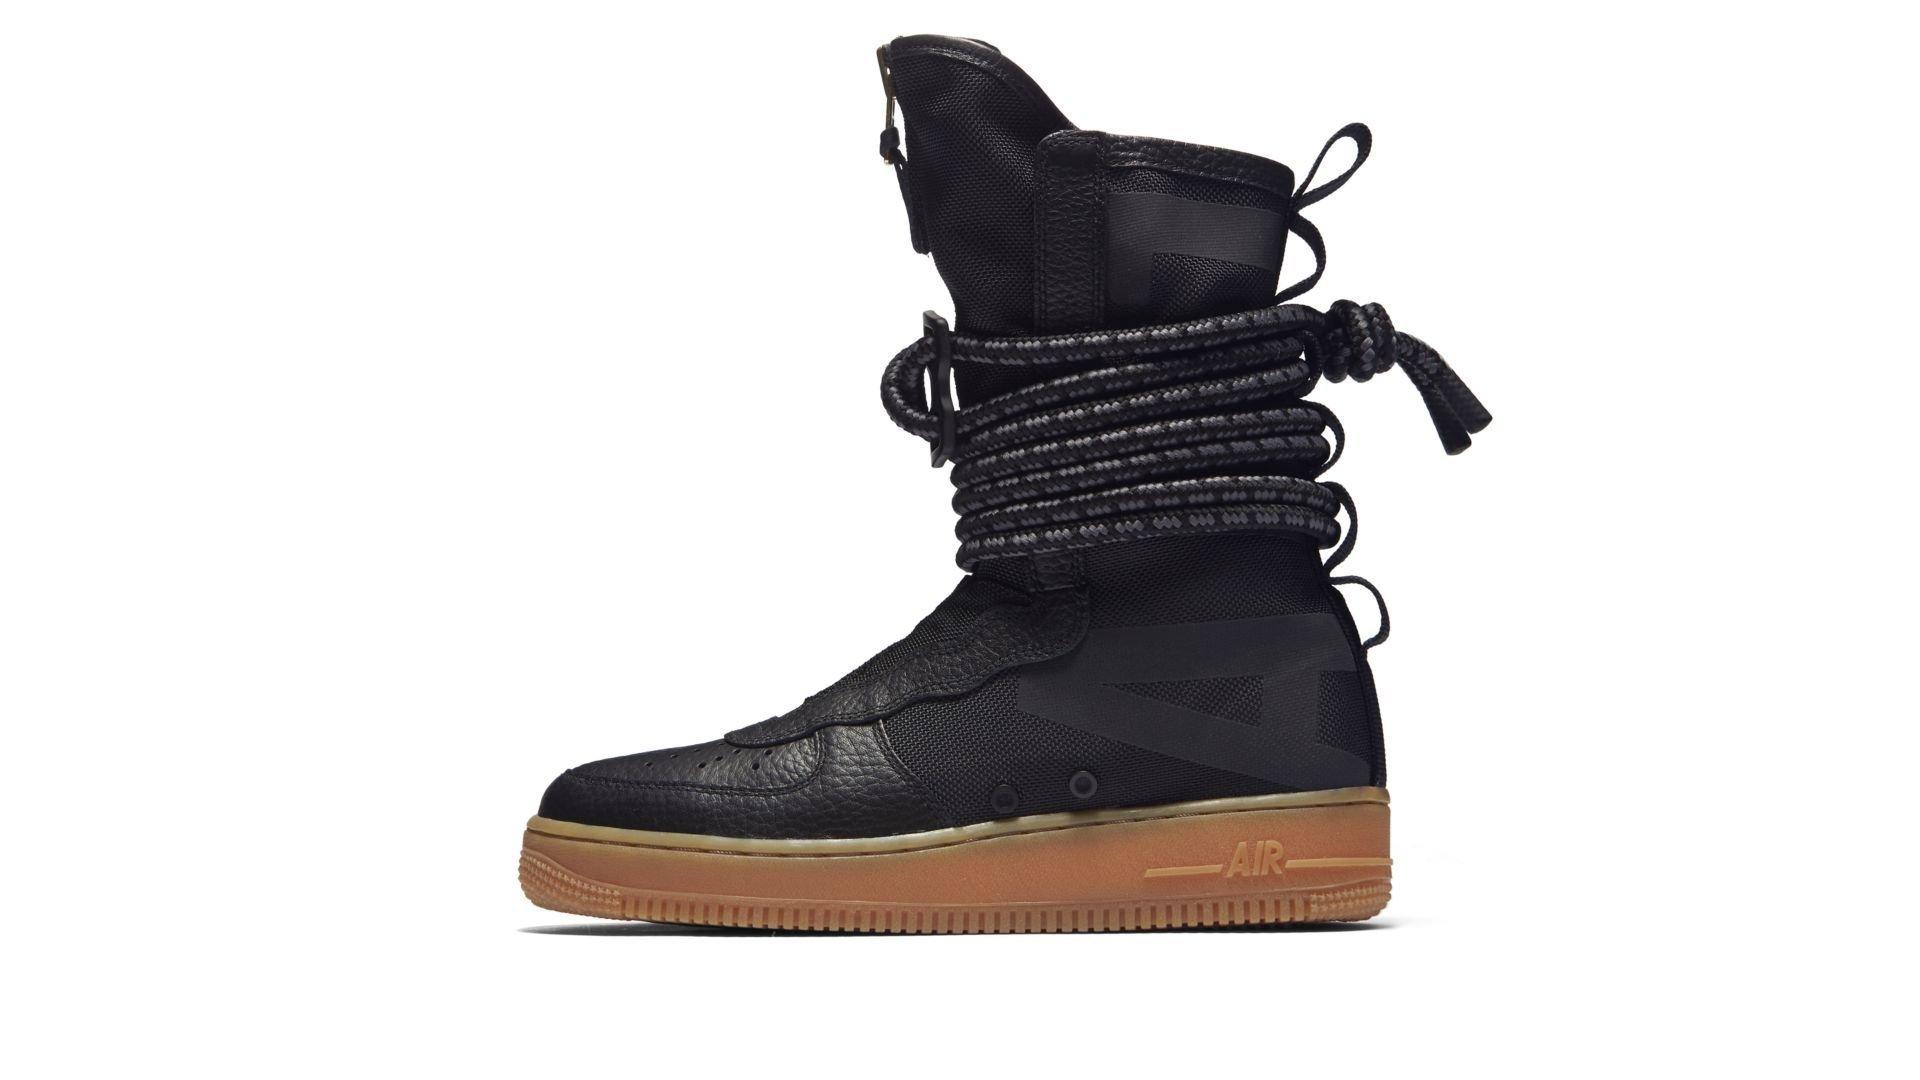 Nike SF Air Force 1 High Black Gum (W) (AA3965-001)